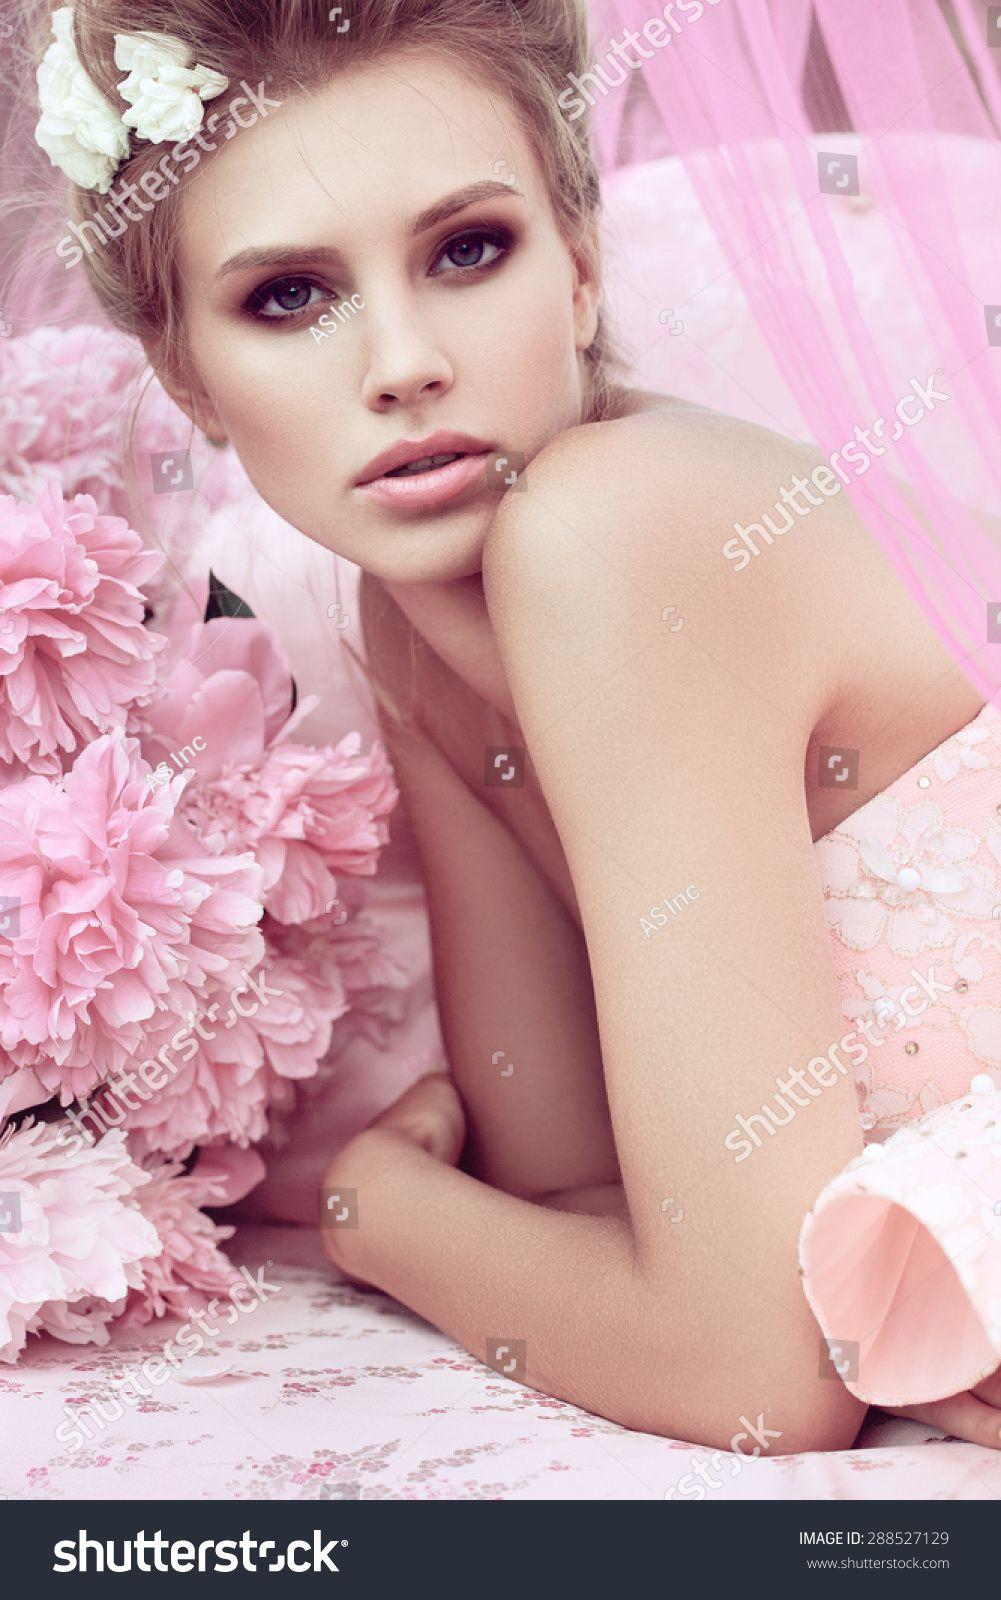 Beautiful girl in the flower garden. Princess. #Sponsored , #Ad, #girl#Beautiful#flower#Princess